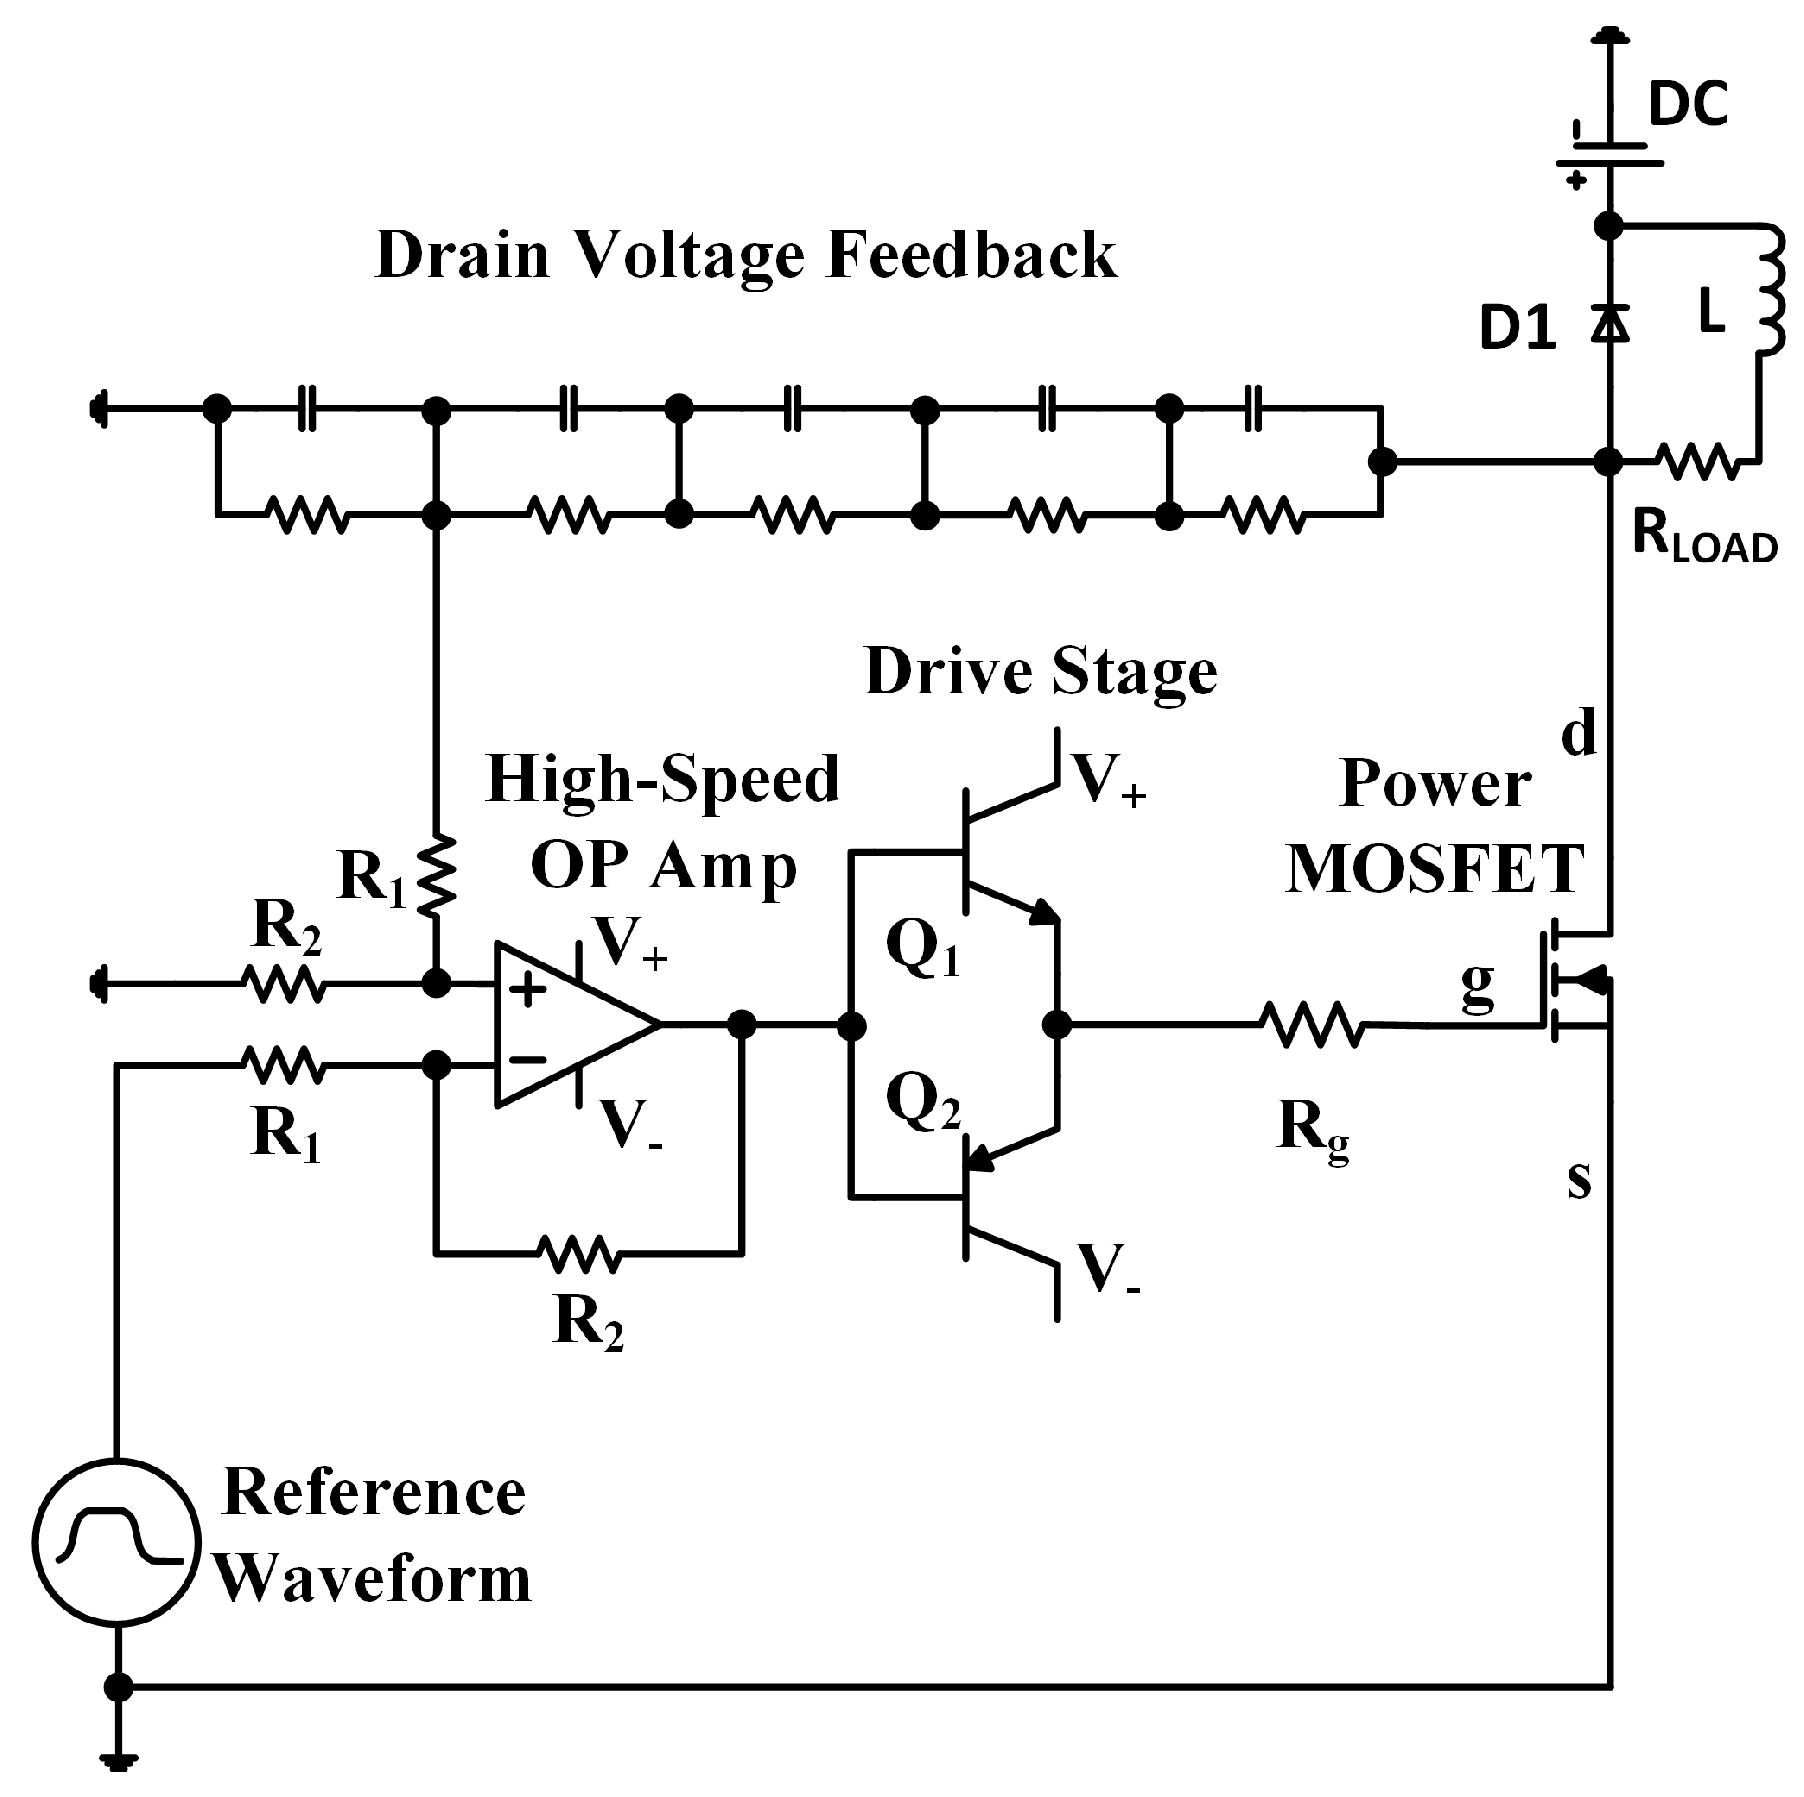 Led Light Bulb Circuit Diagram Http Circuitdiagramhqewnet - Wiring on